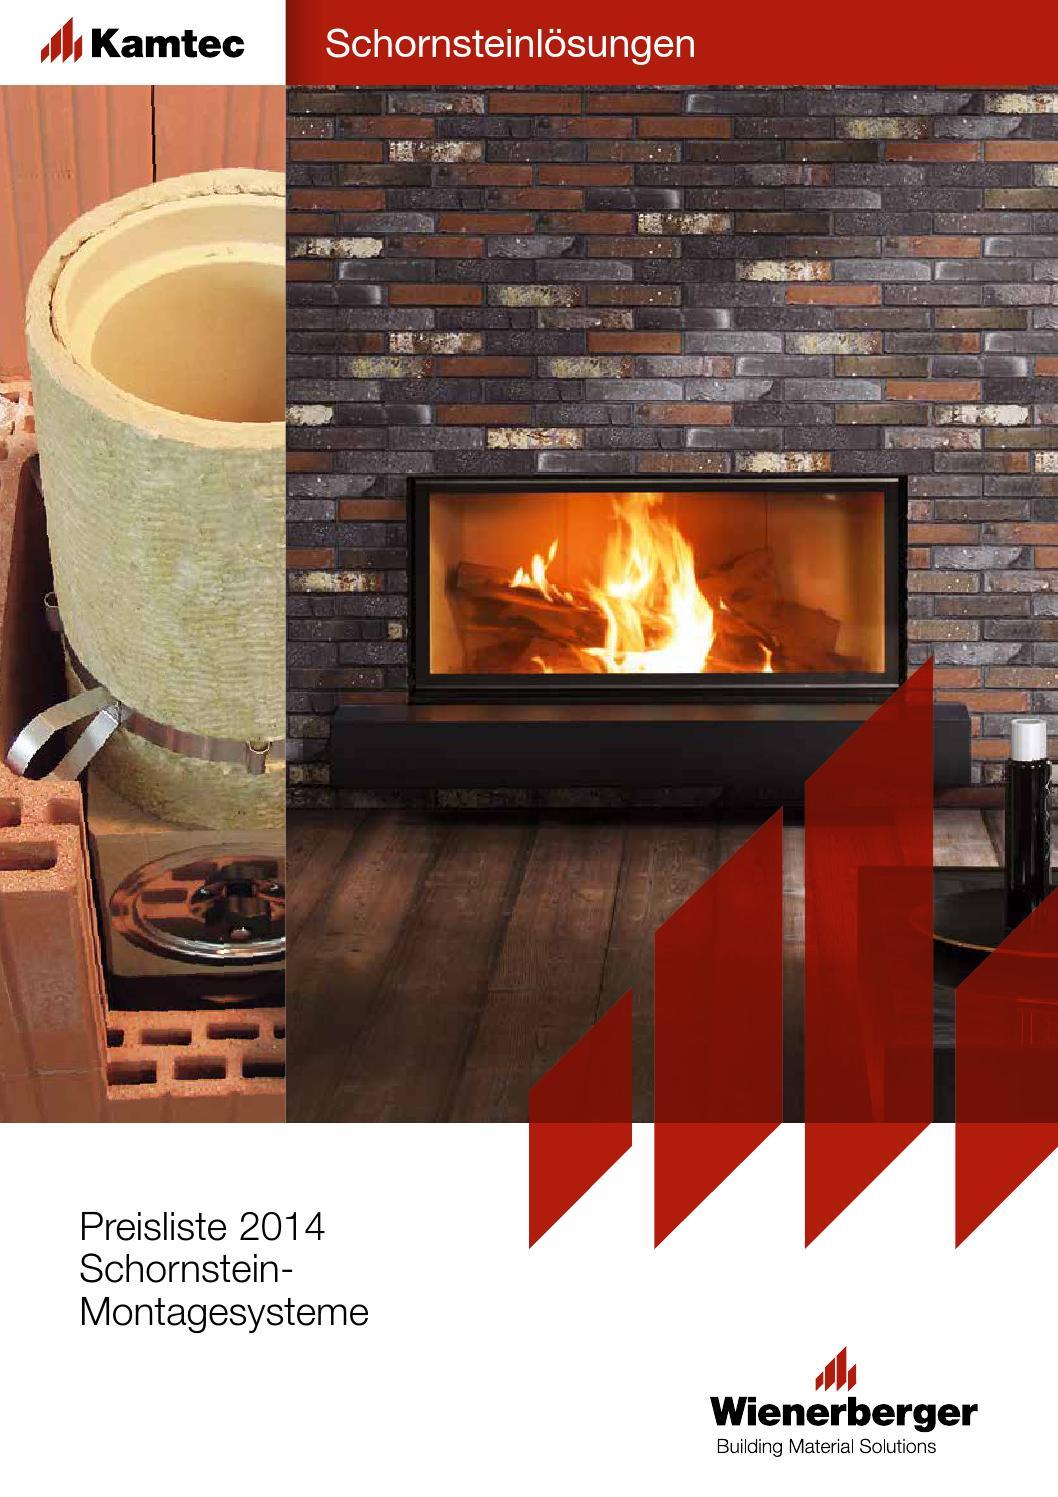 preisliste kamtec 2014 by wienerberger ag issuu. Black Bedroom Furniture Sets. Home Design Ideas